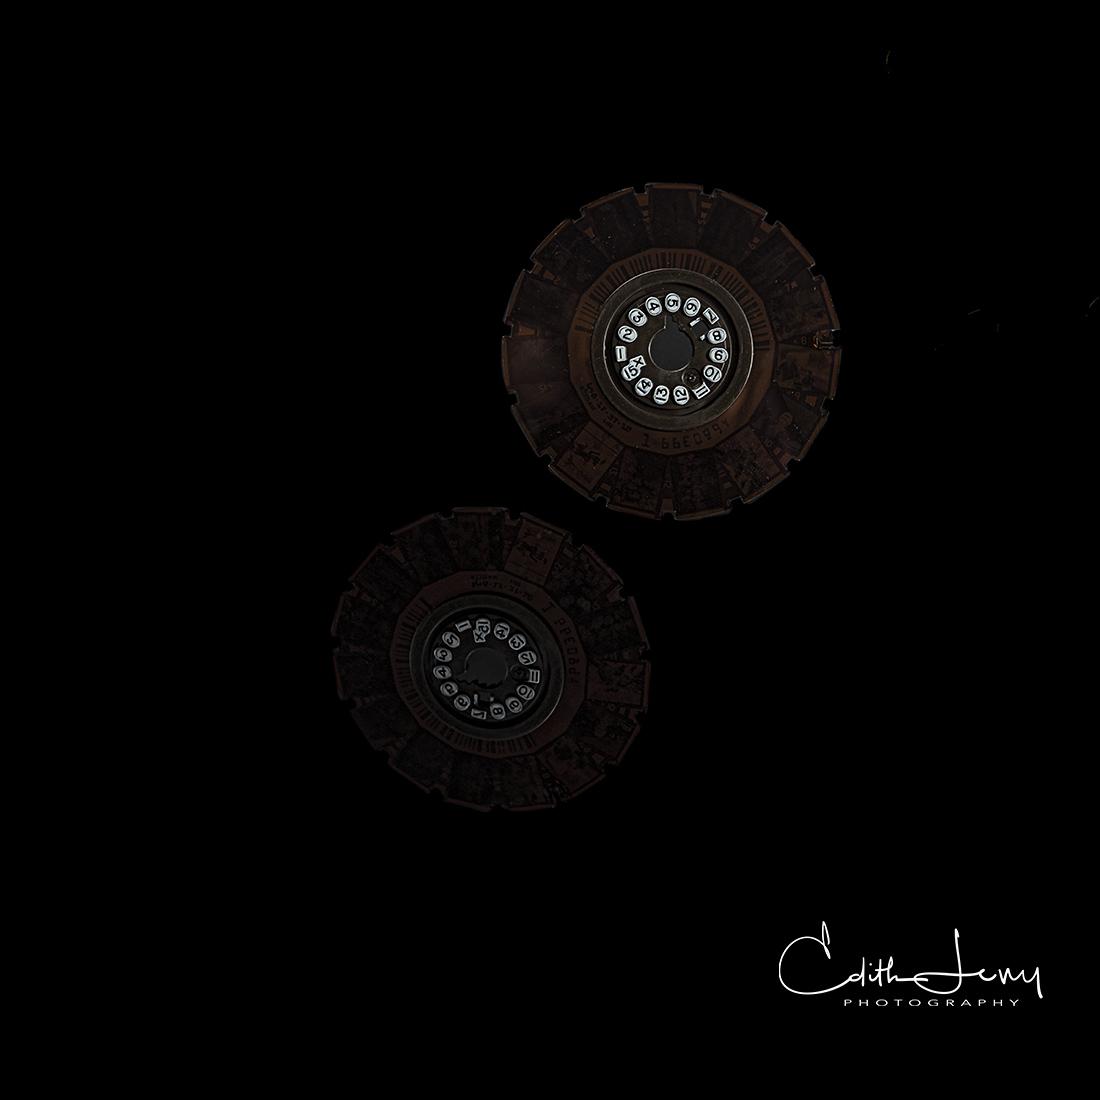 Disc, film, photo